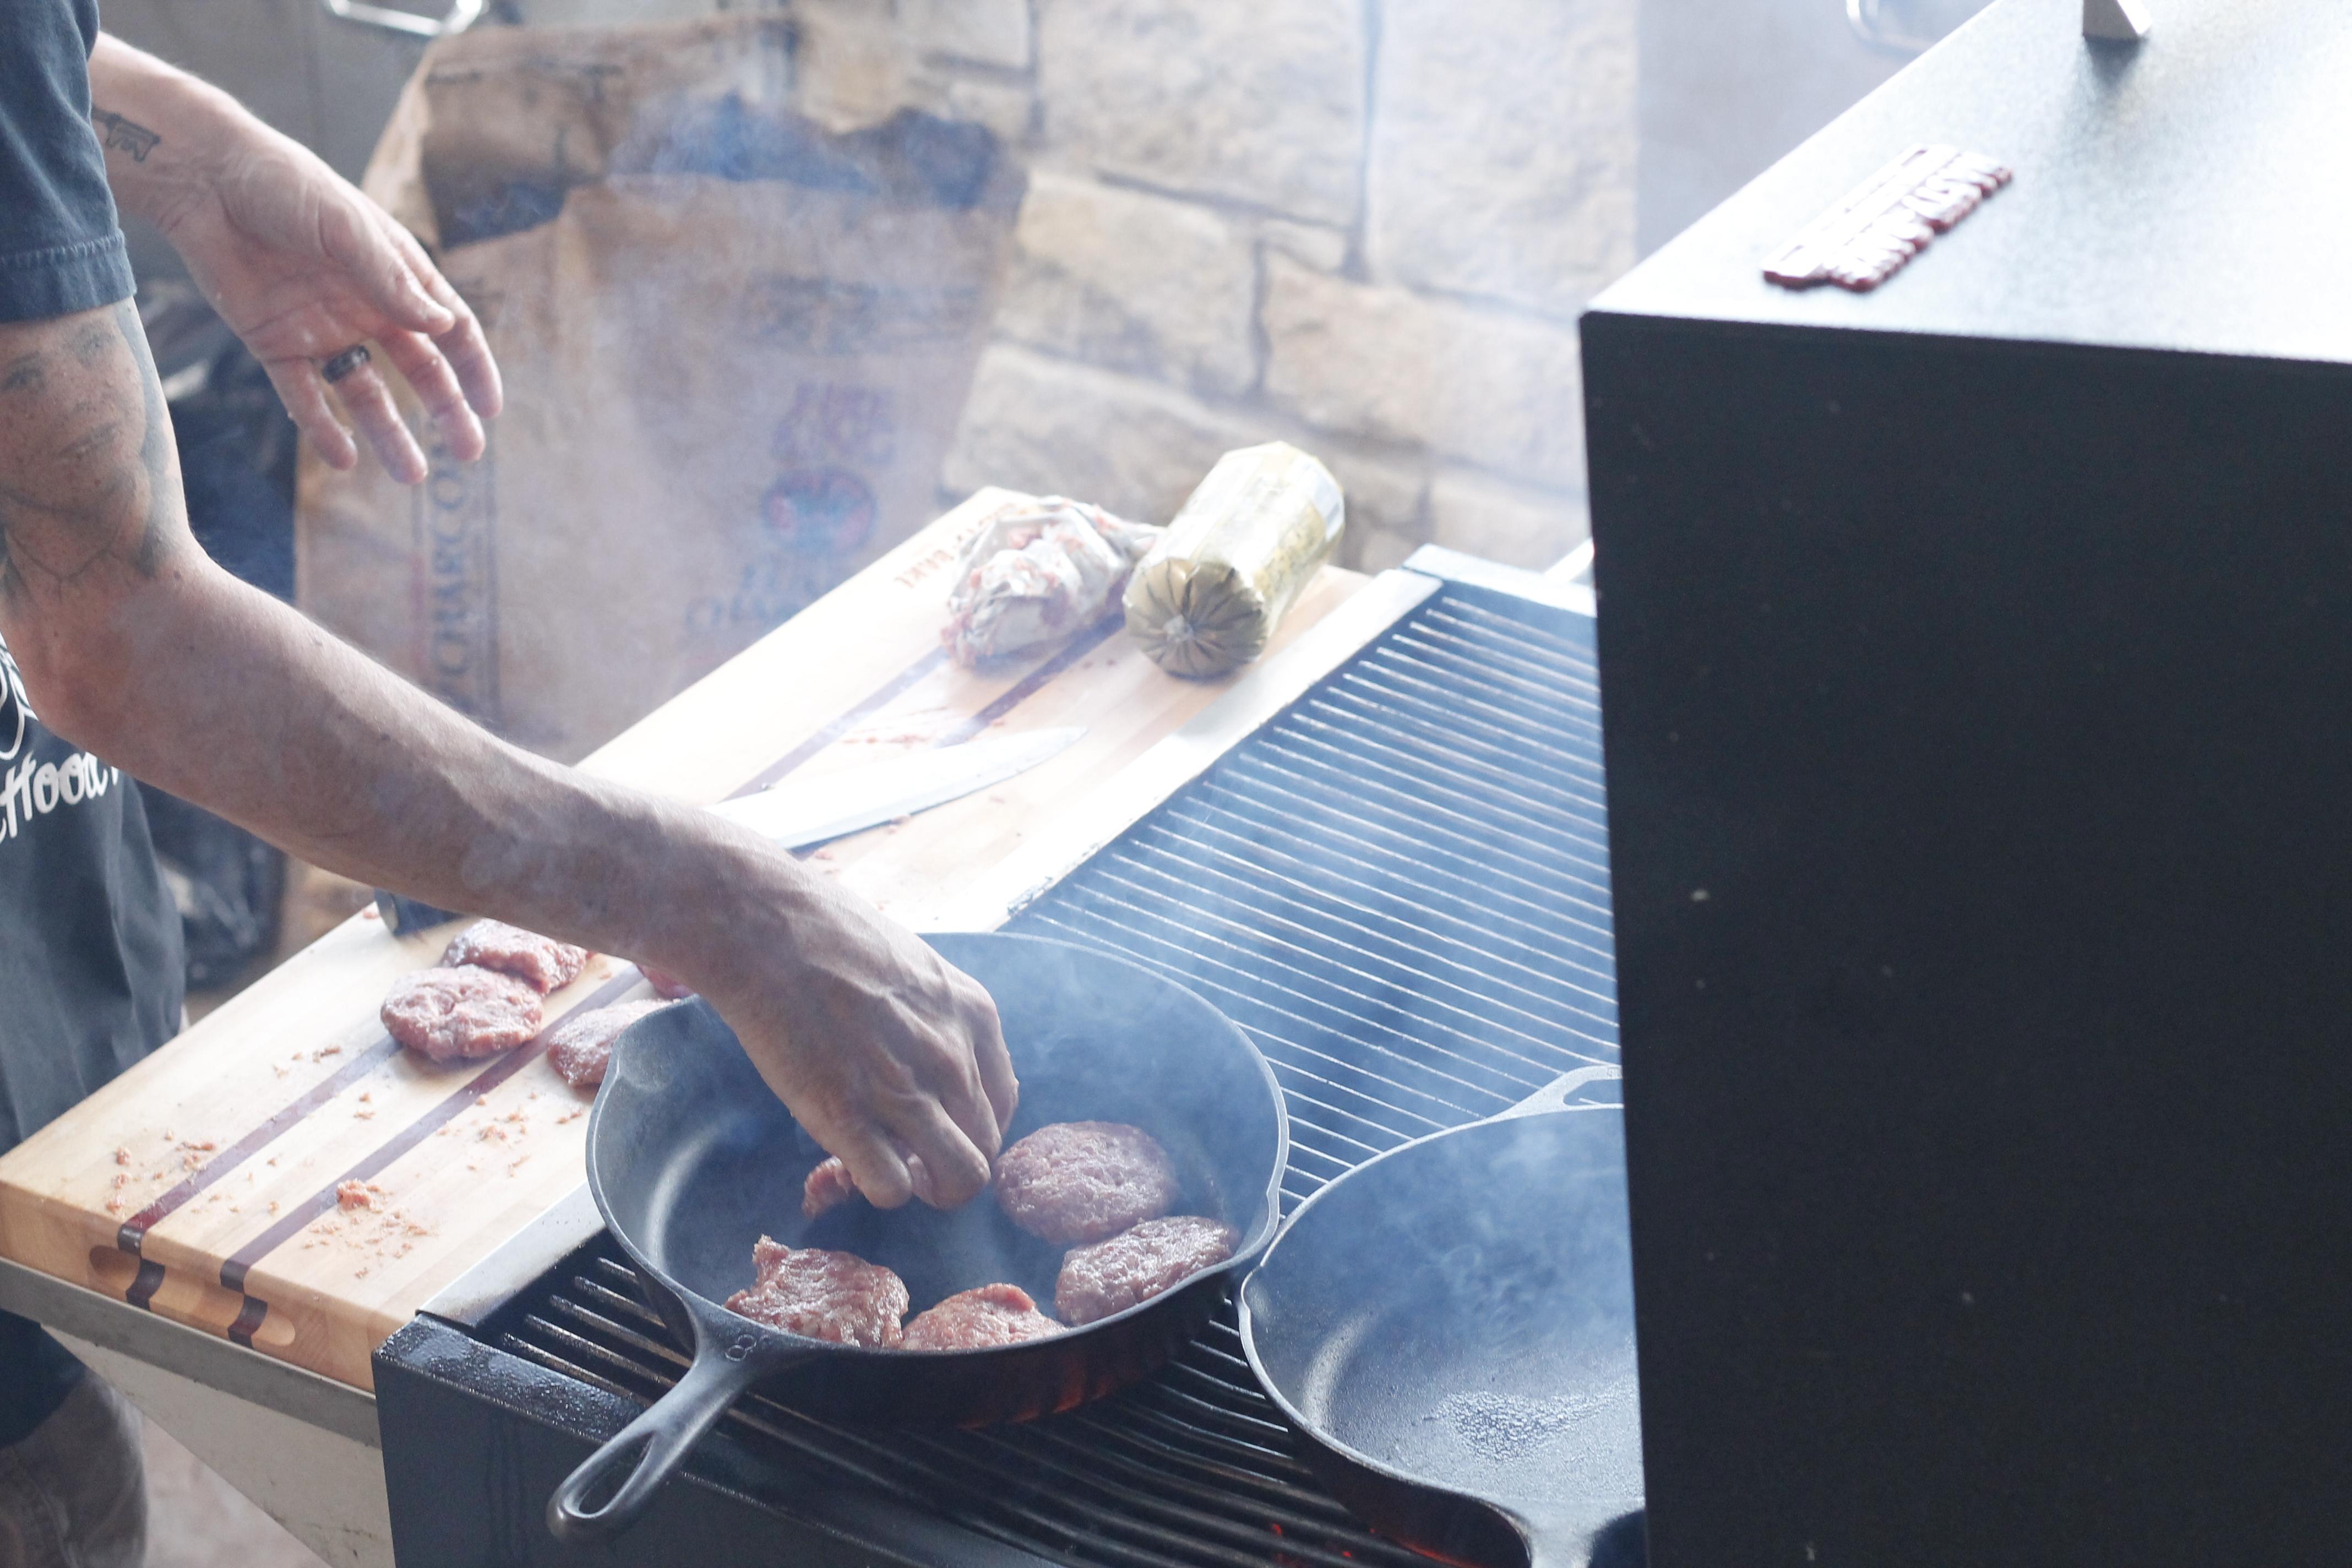 Tailgate Breakfast on the Grill! | Pit Buddies BBQ